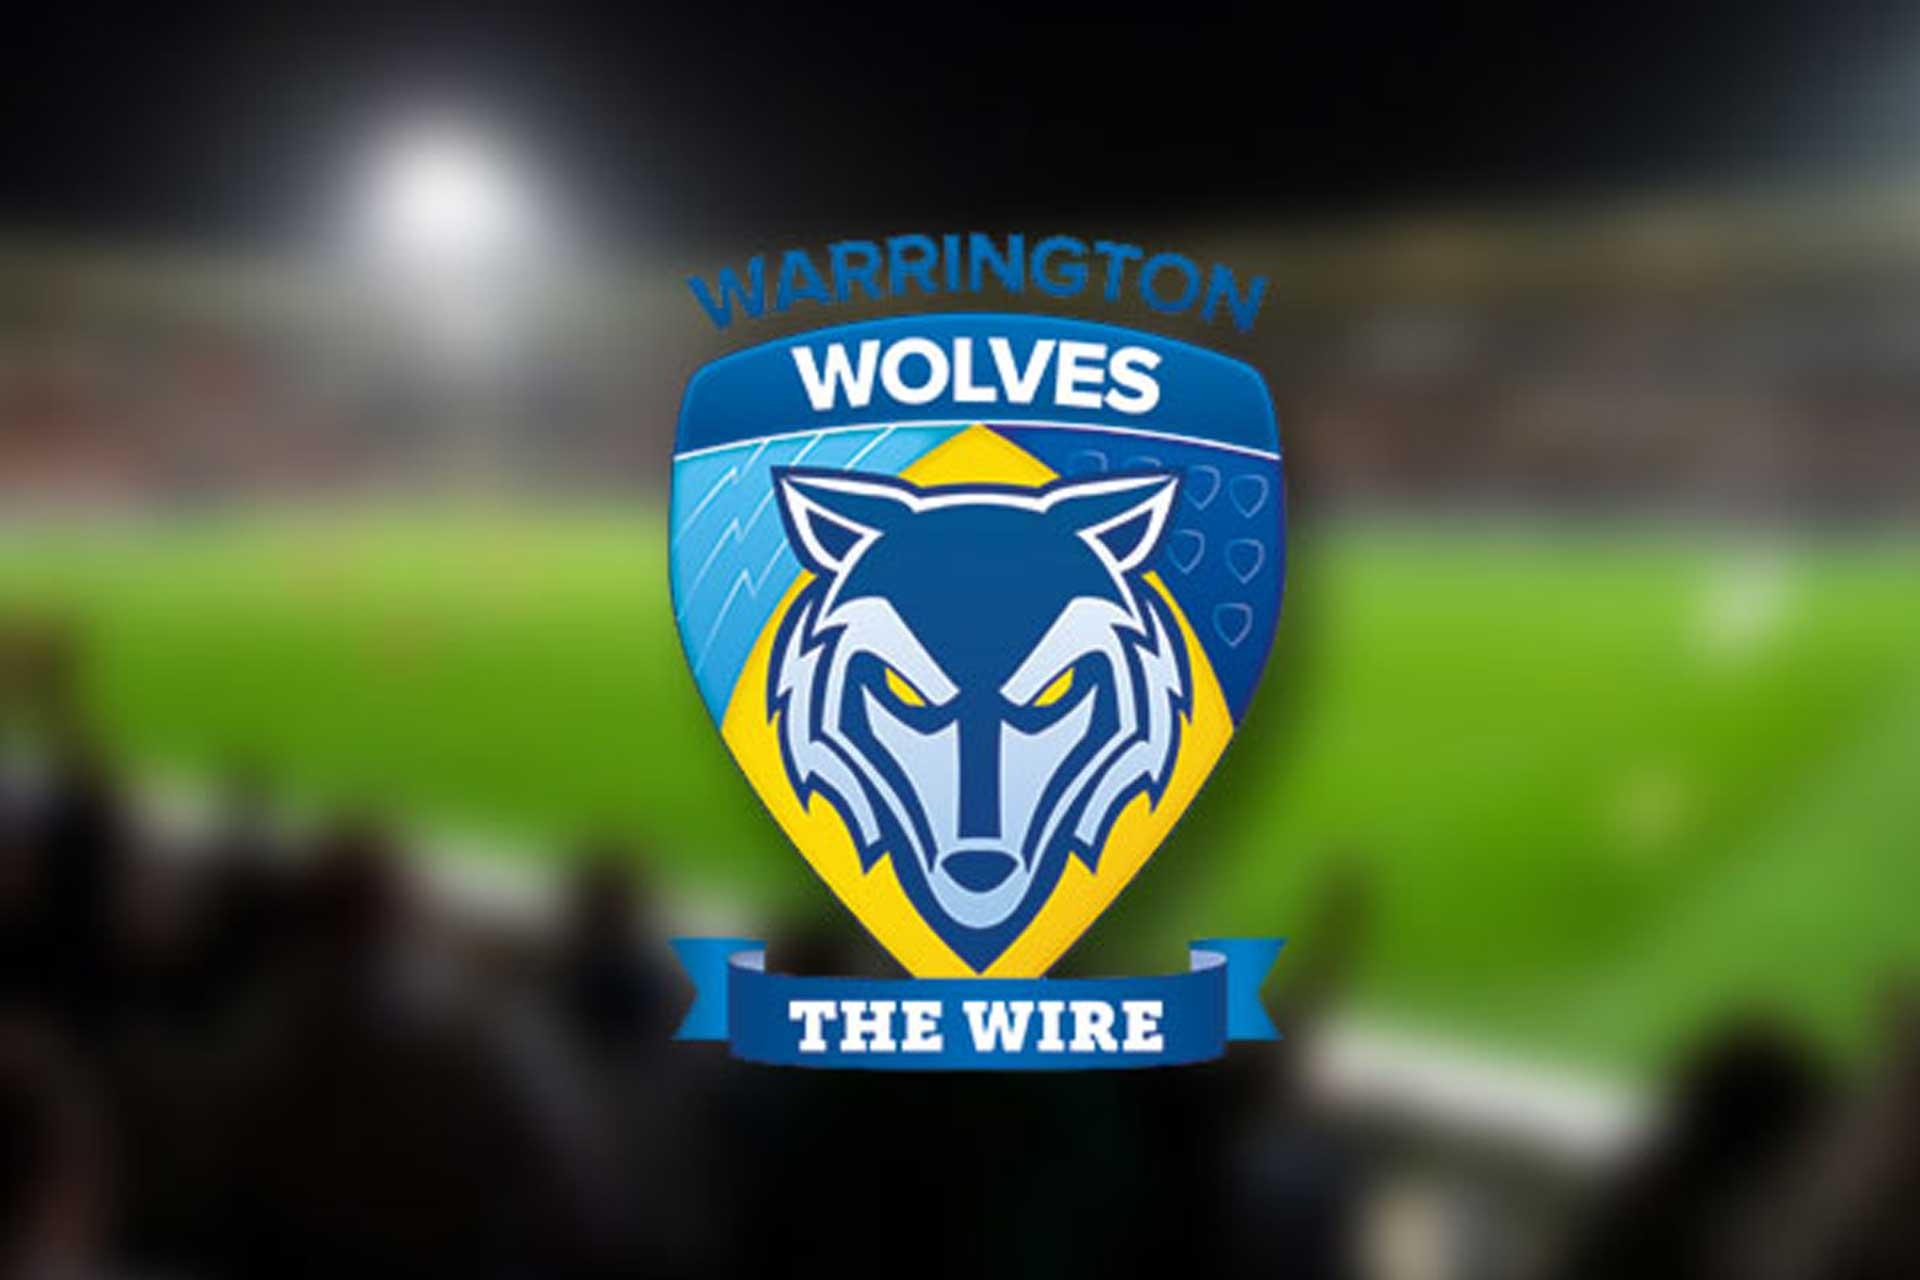 Warrington Wolves club badge